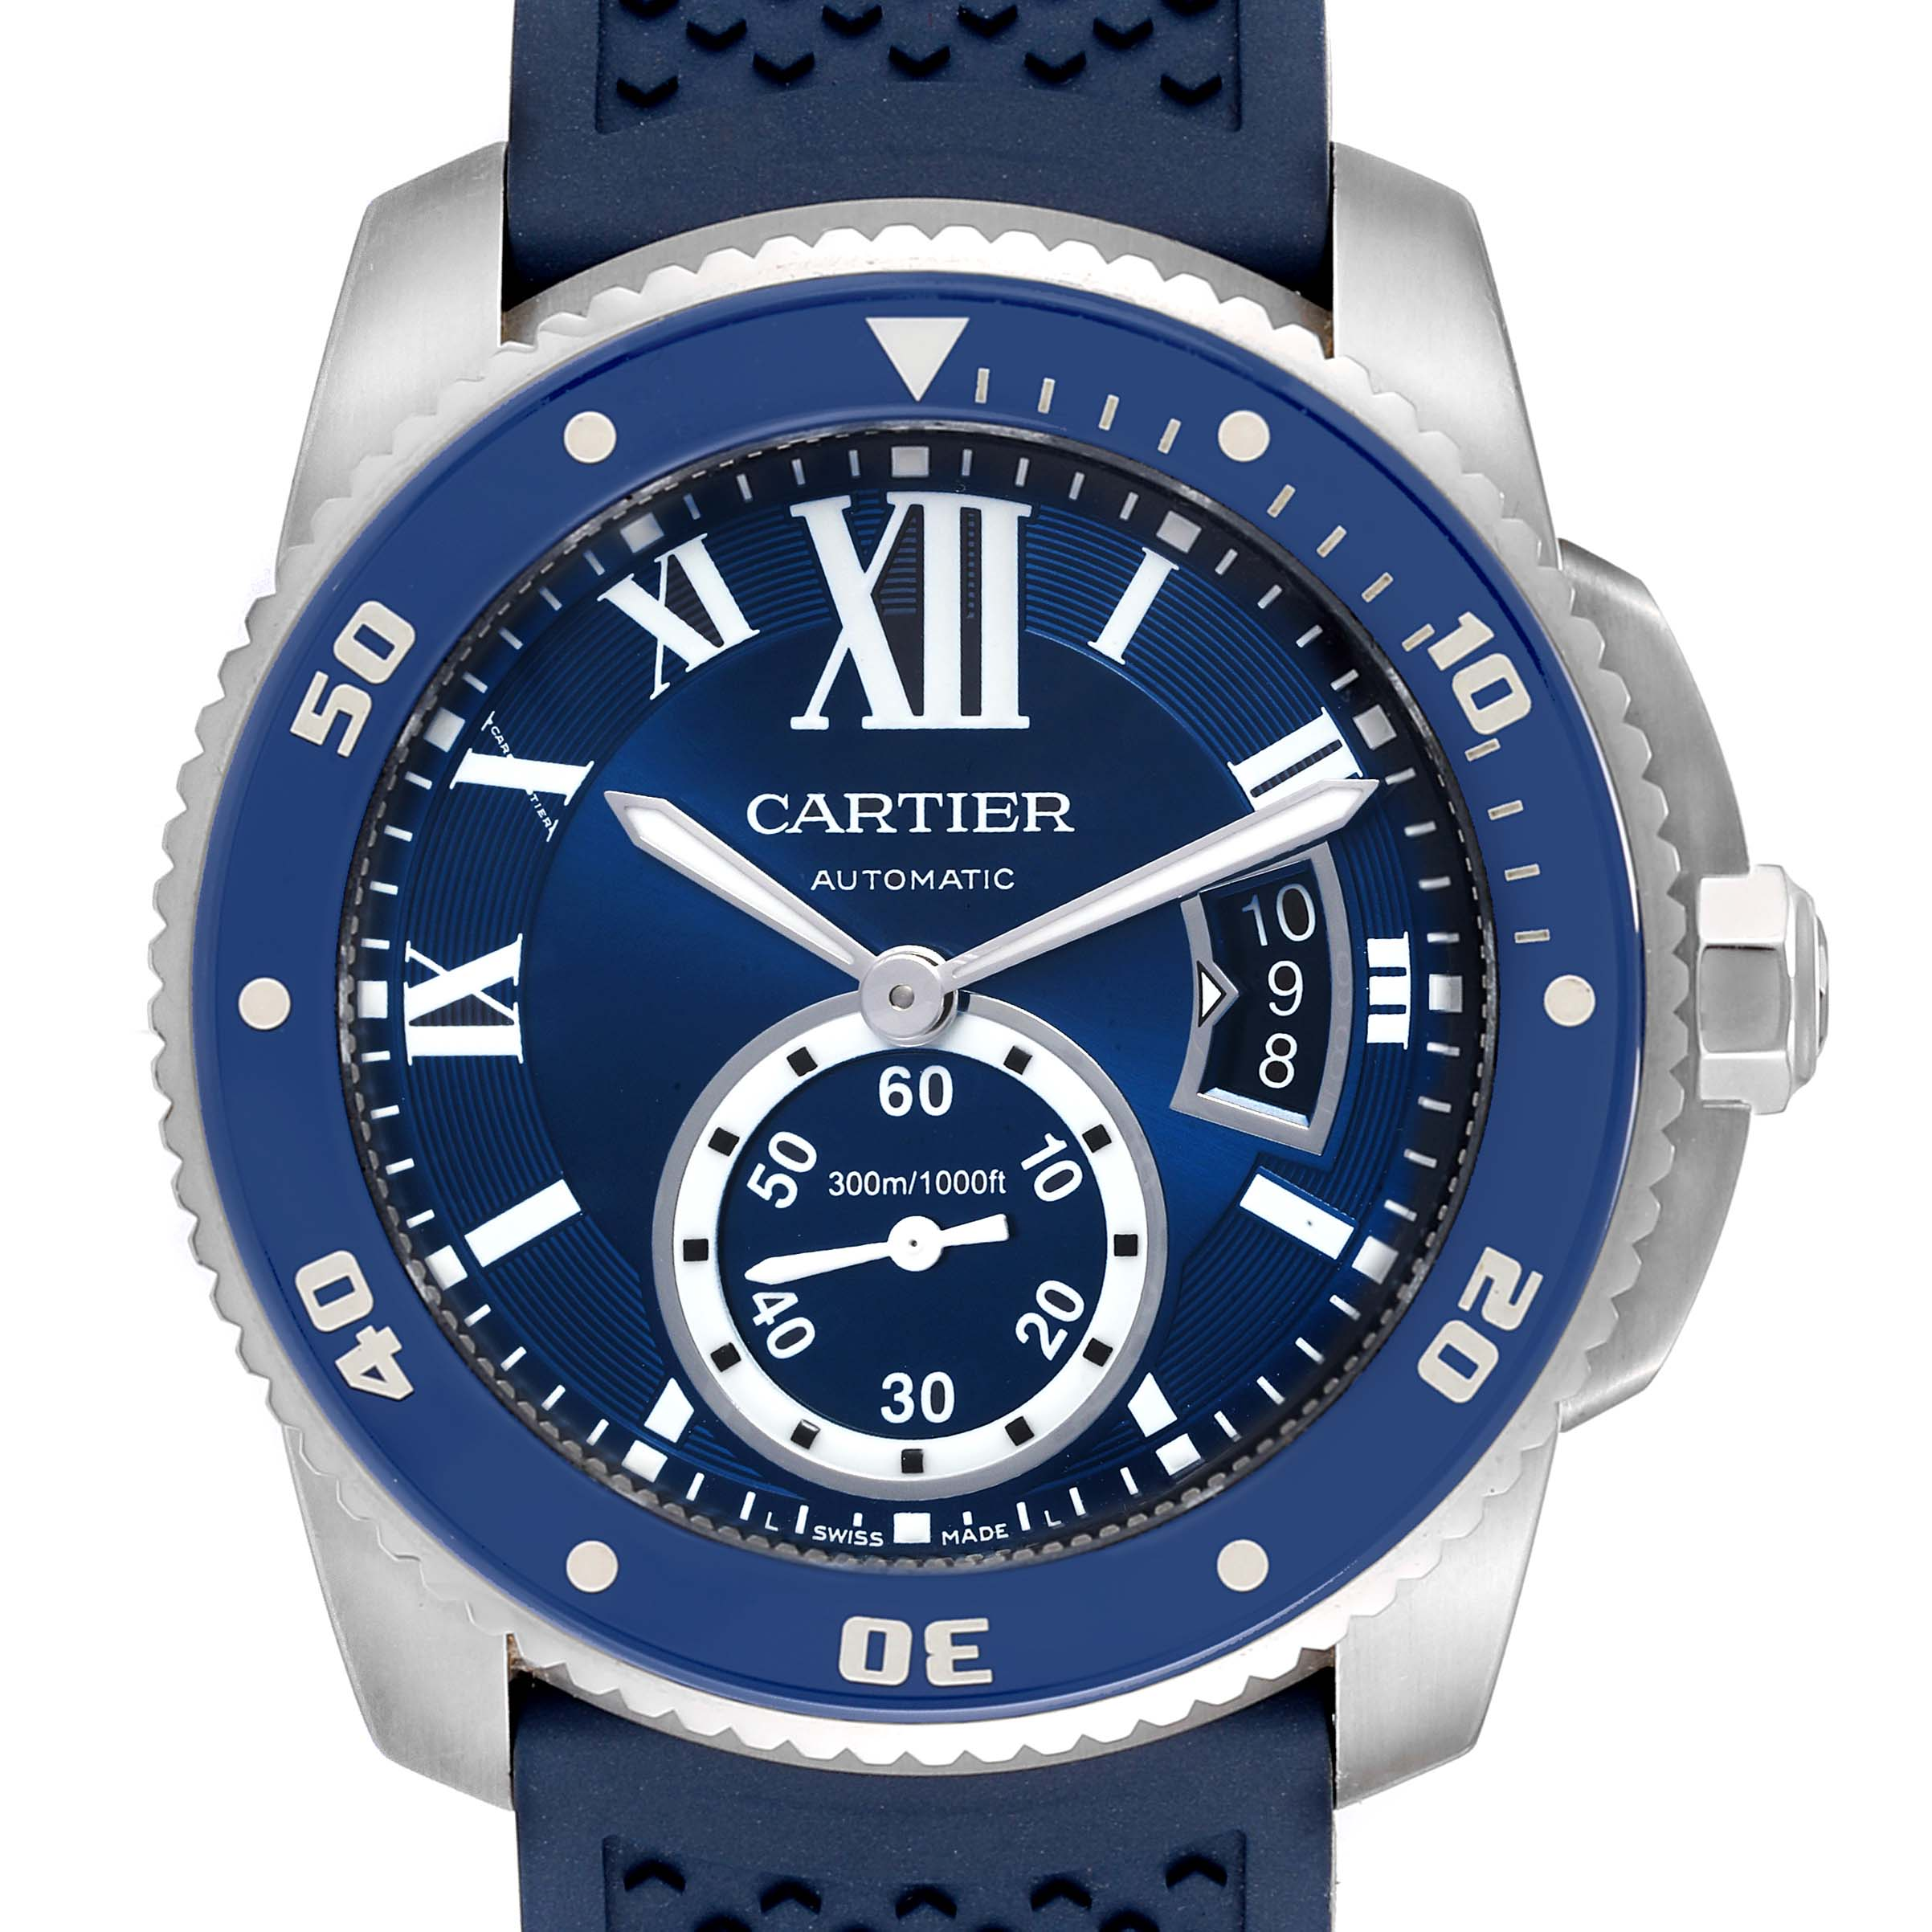 Cartier Calibre Diver Blue Dial Rubber Strap Steel Mens Watch WSCA0011